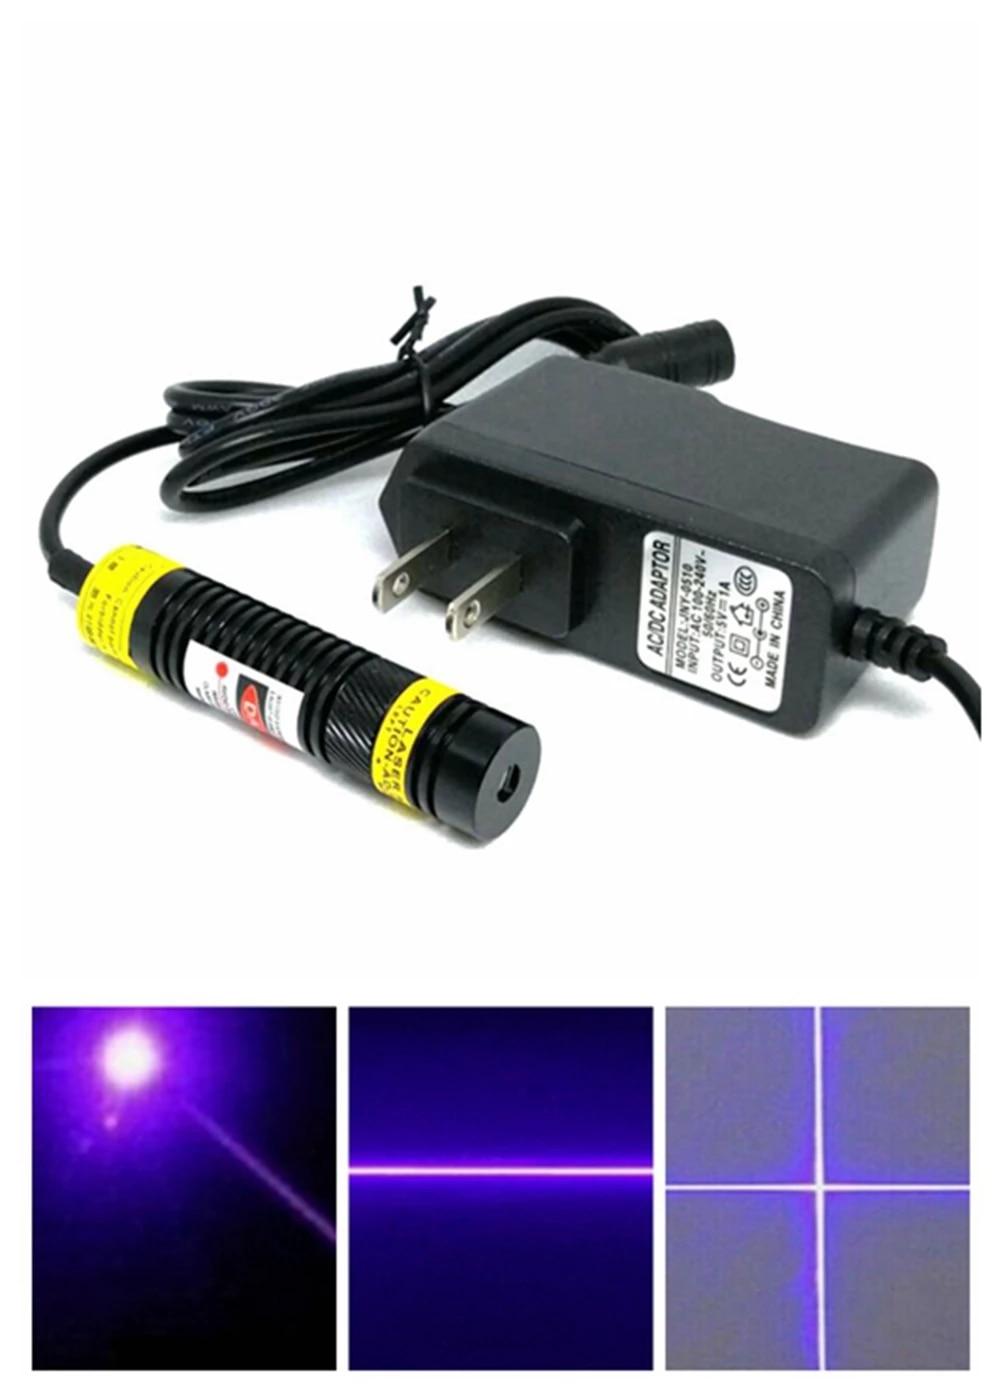 Dot% 2FLine% 2FCross Регулируемый 405 нм 200 мВт Лазер Диод Модуль 16x68 мм High Power Light с адаптером